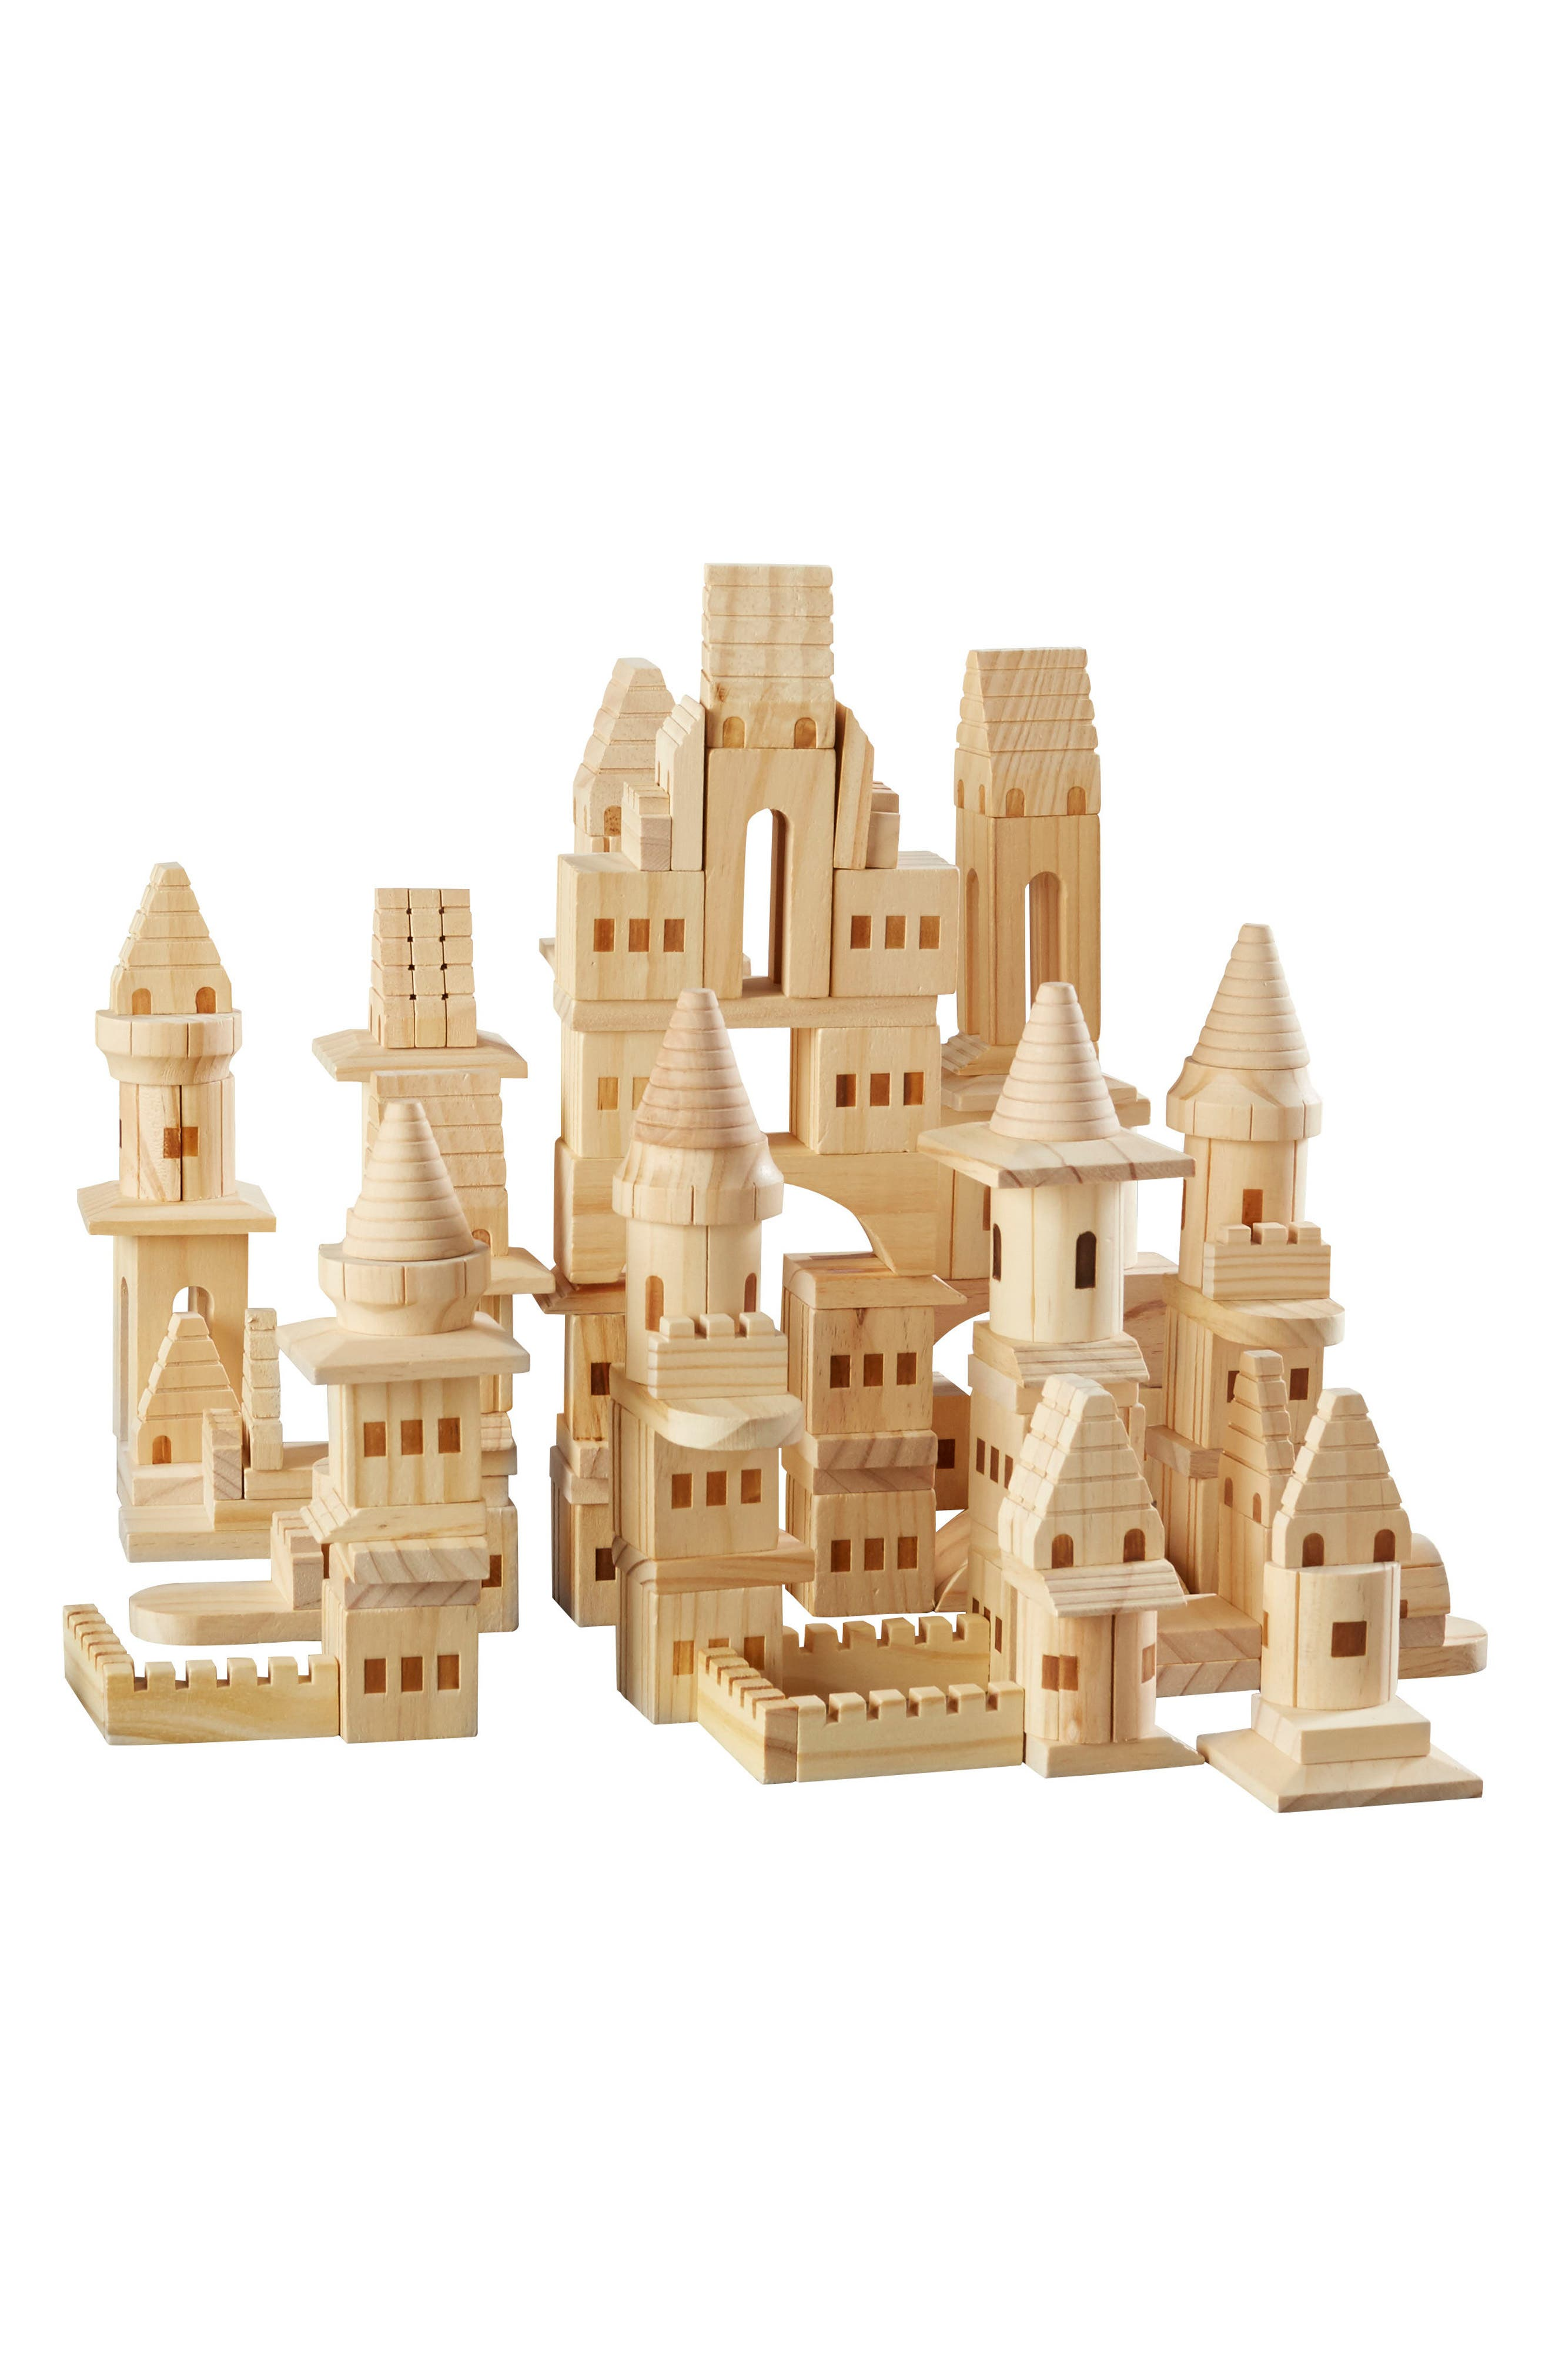 Toddler Fao Schwarz 150Piece Wood Castle Building Block Set